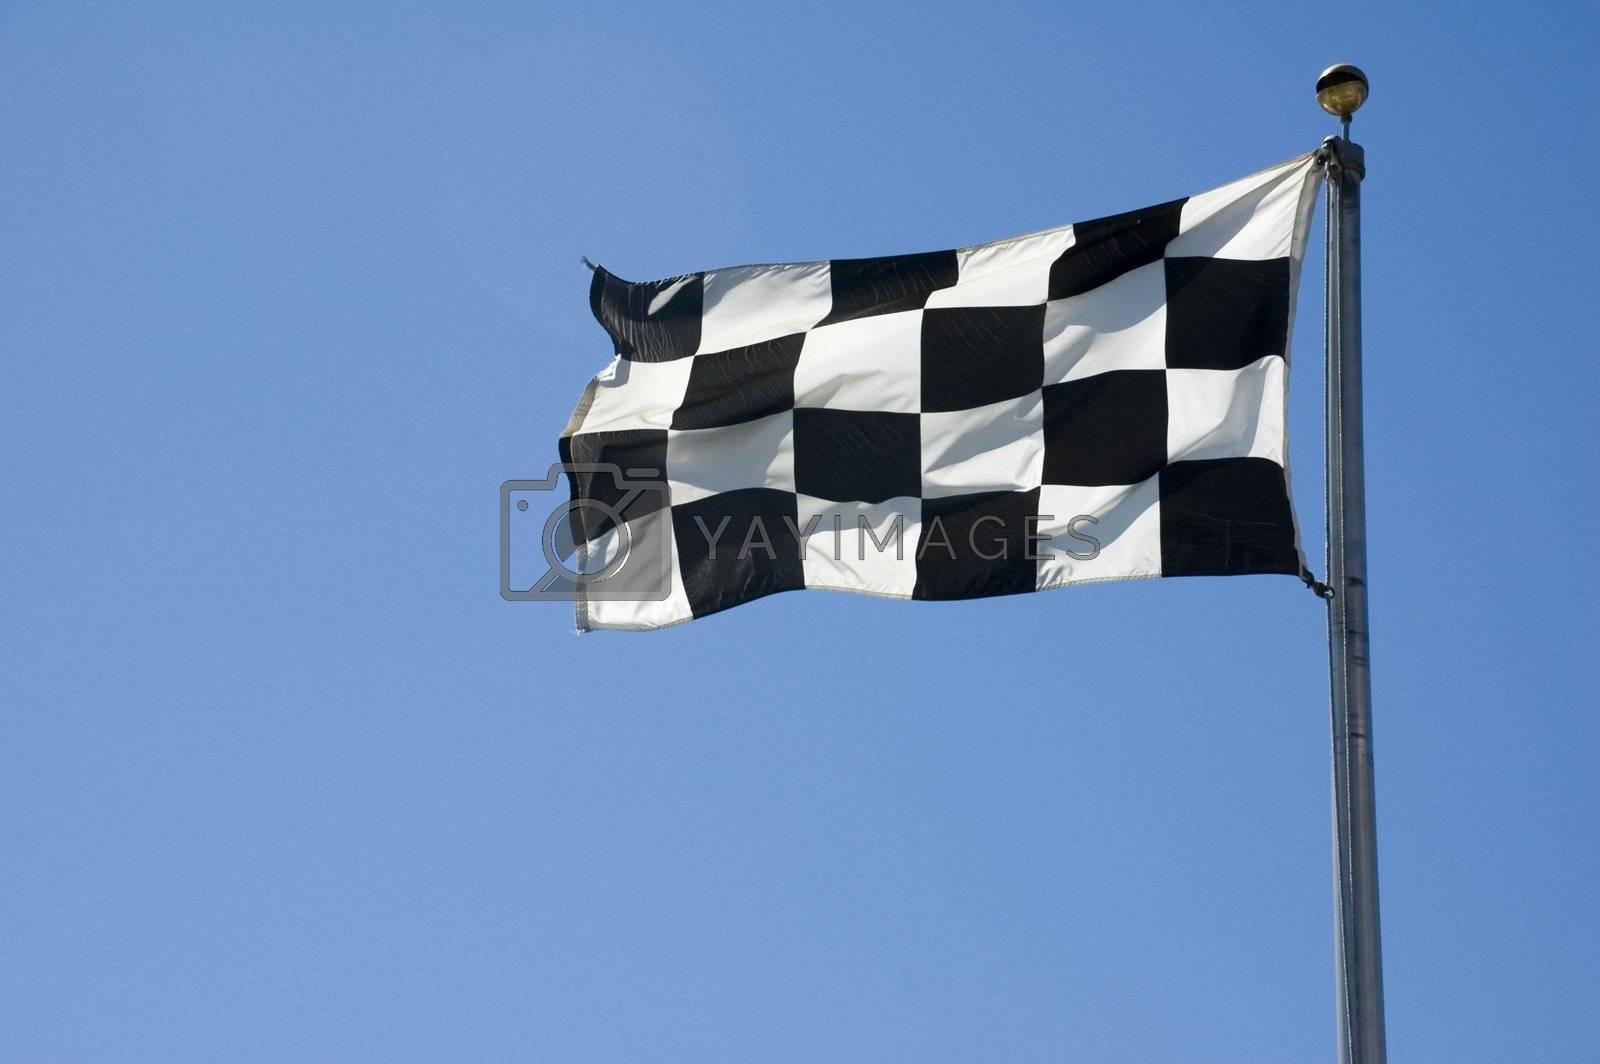 A finish line flag on a pole at a raceway.